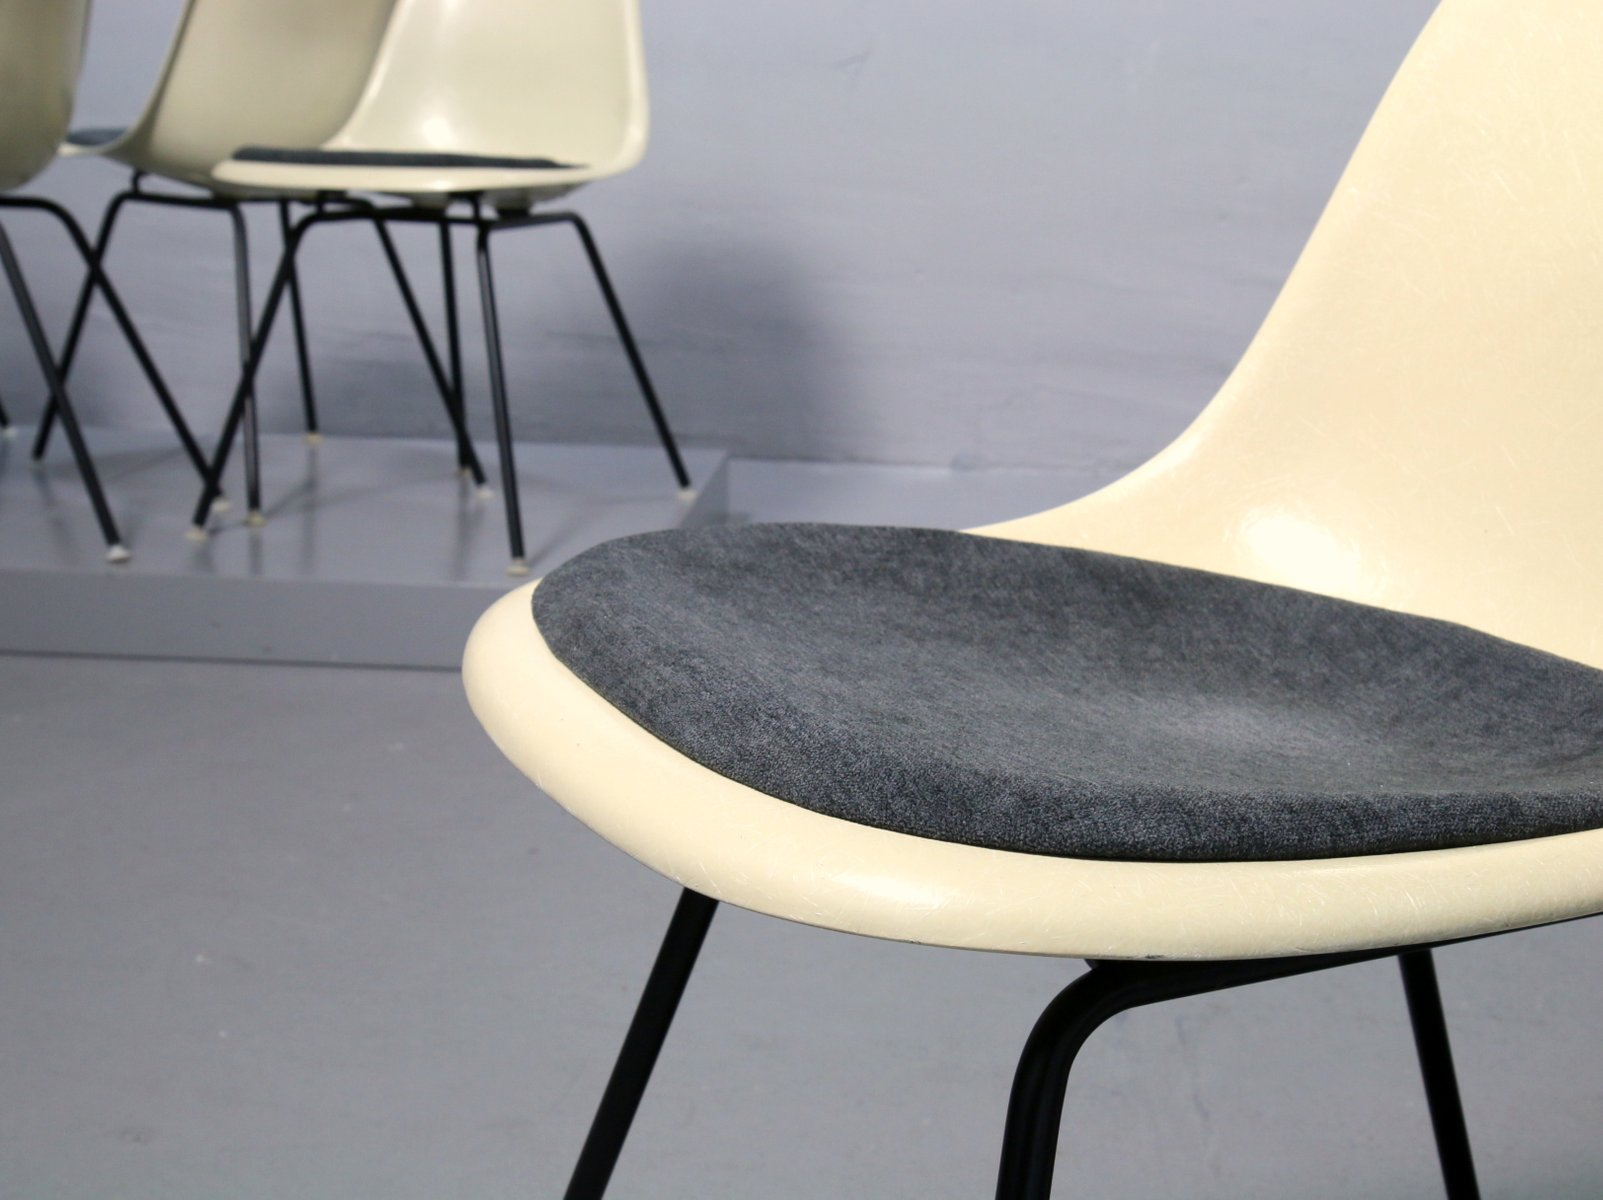 vintage fiberglas stuhl von charles ray eames f r vitra bei pamono kaufen. Black Bedroom Furniture Sets. Home Design Ideas